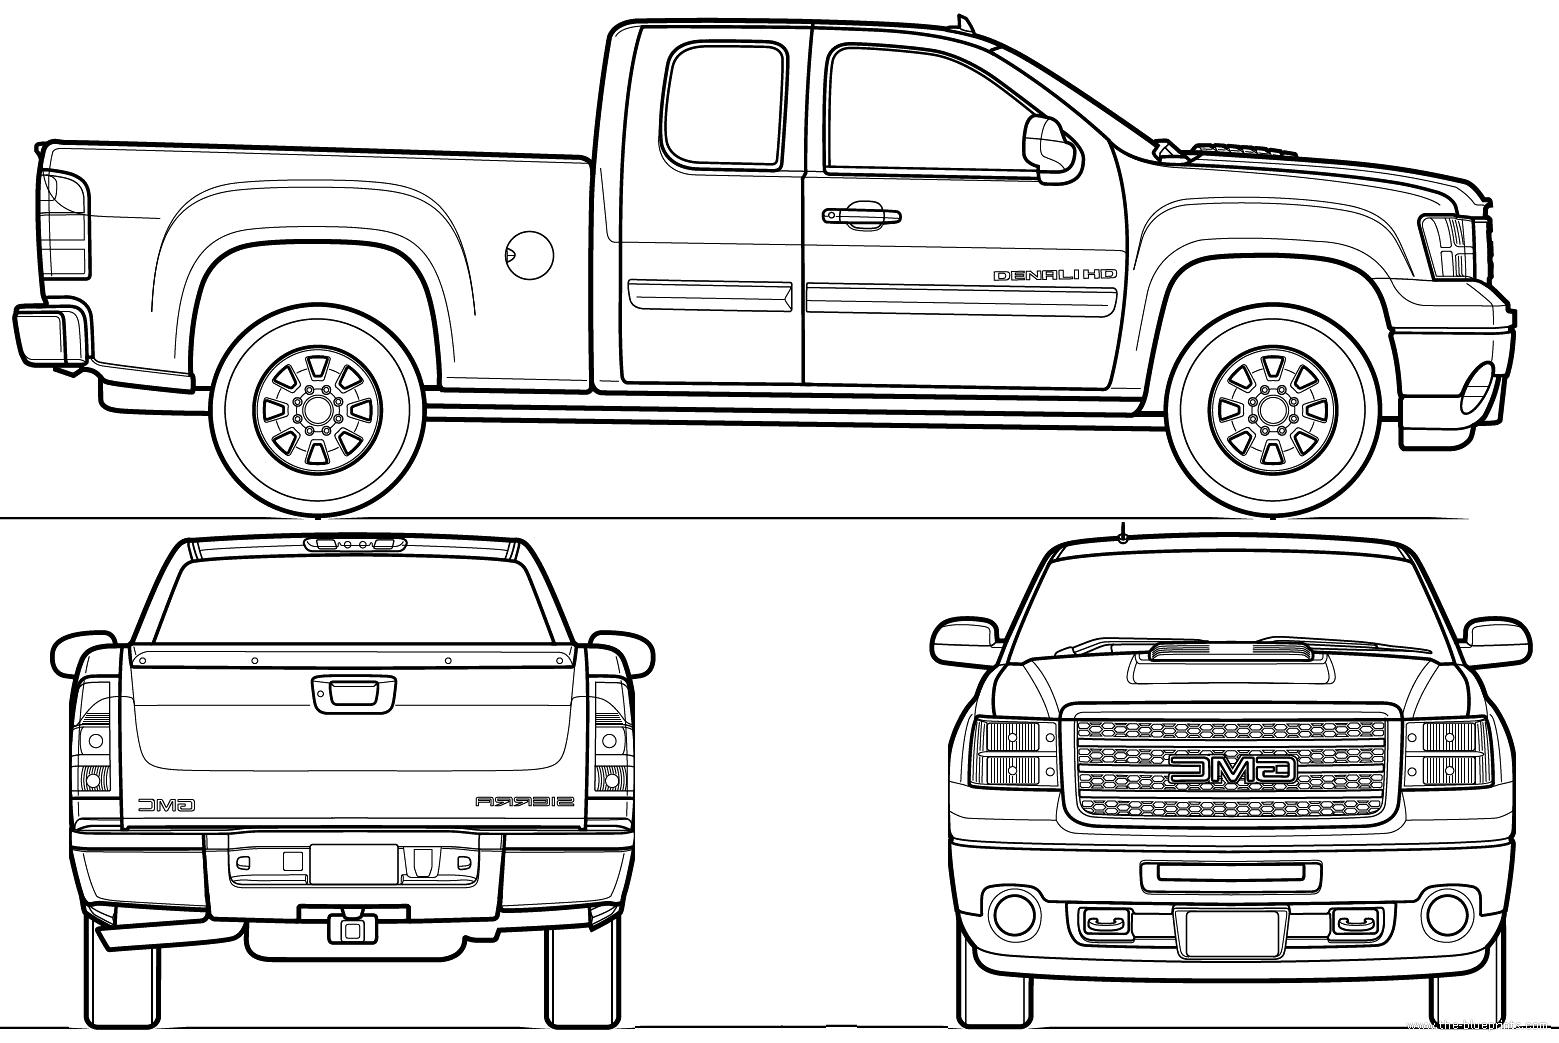 Blueprints Gt Cars Gt Gmc Gt Gmc Sierra Denali Hd